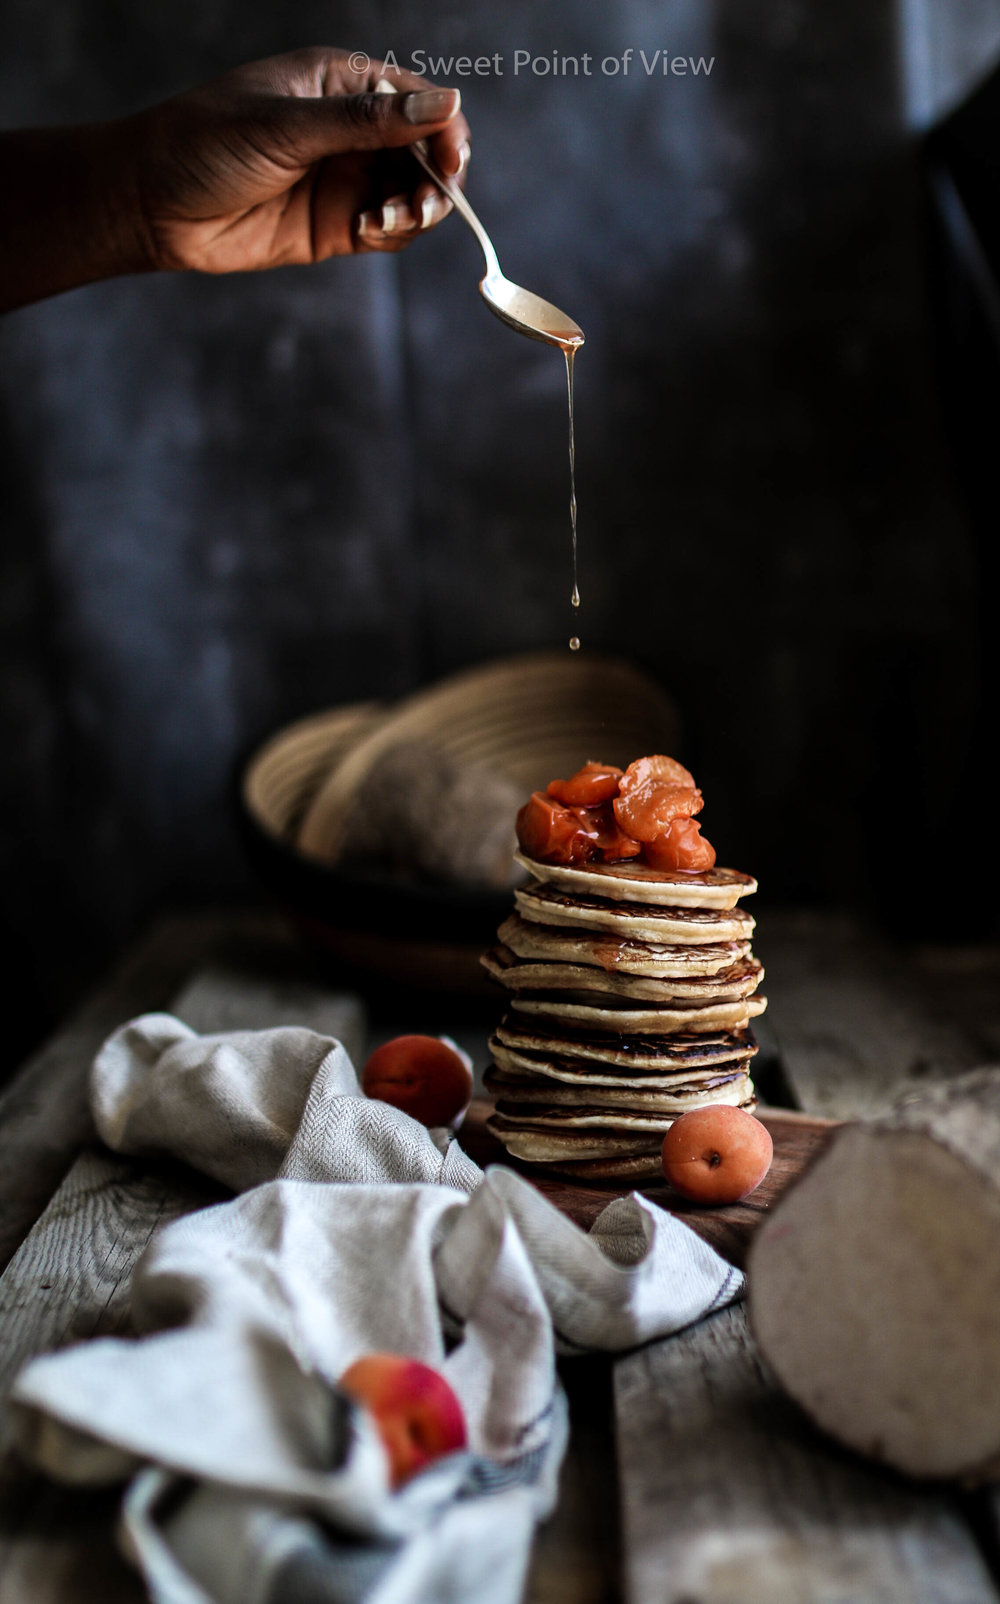 Copy of Yam-Flour-Pancakes-Homemade-Apricot-Yam-9-of-1.jpg